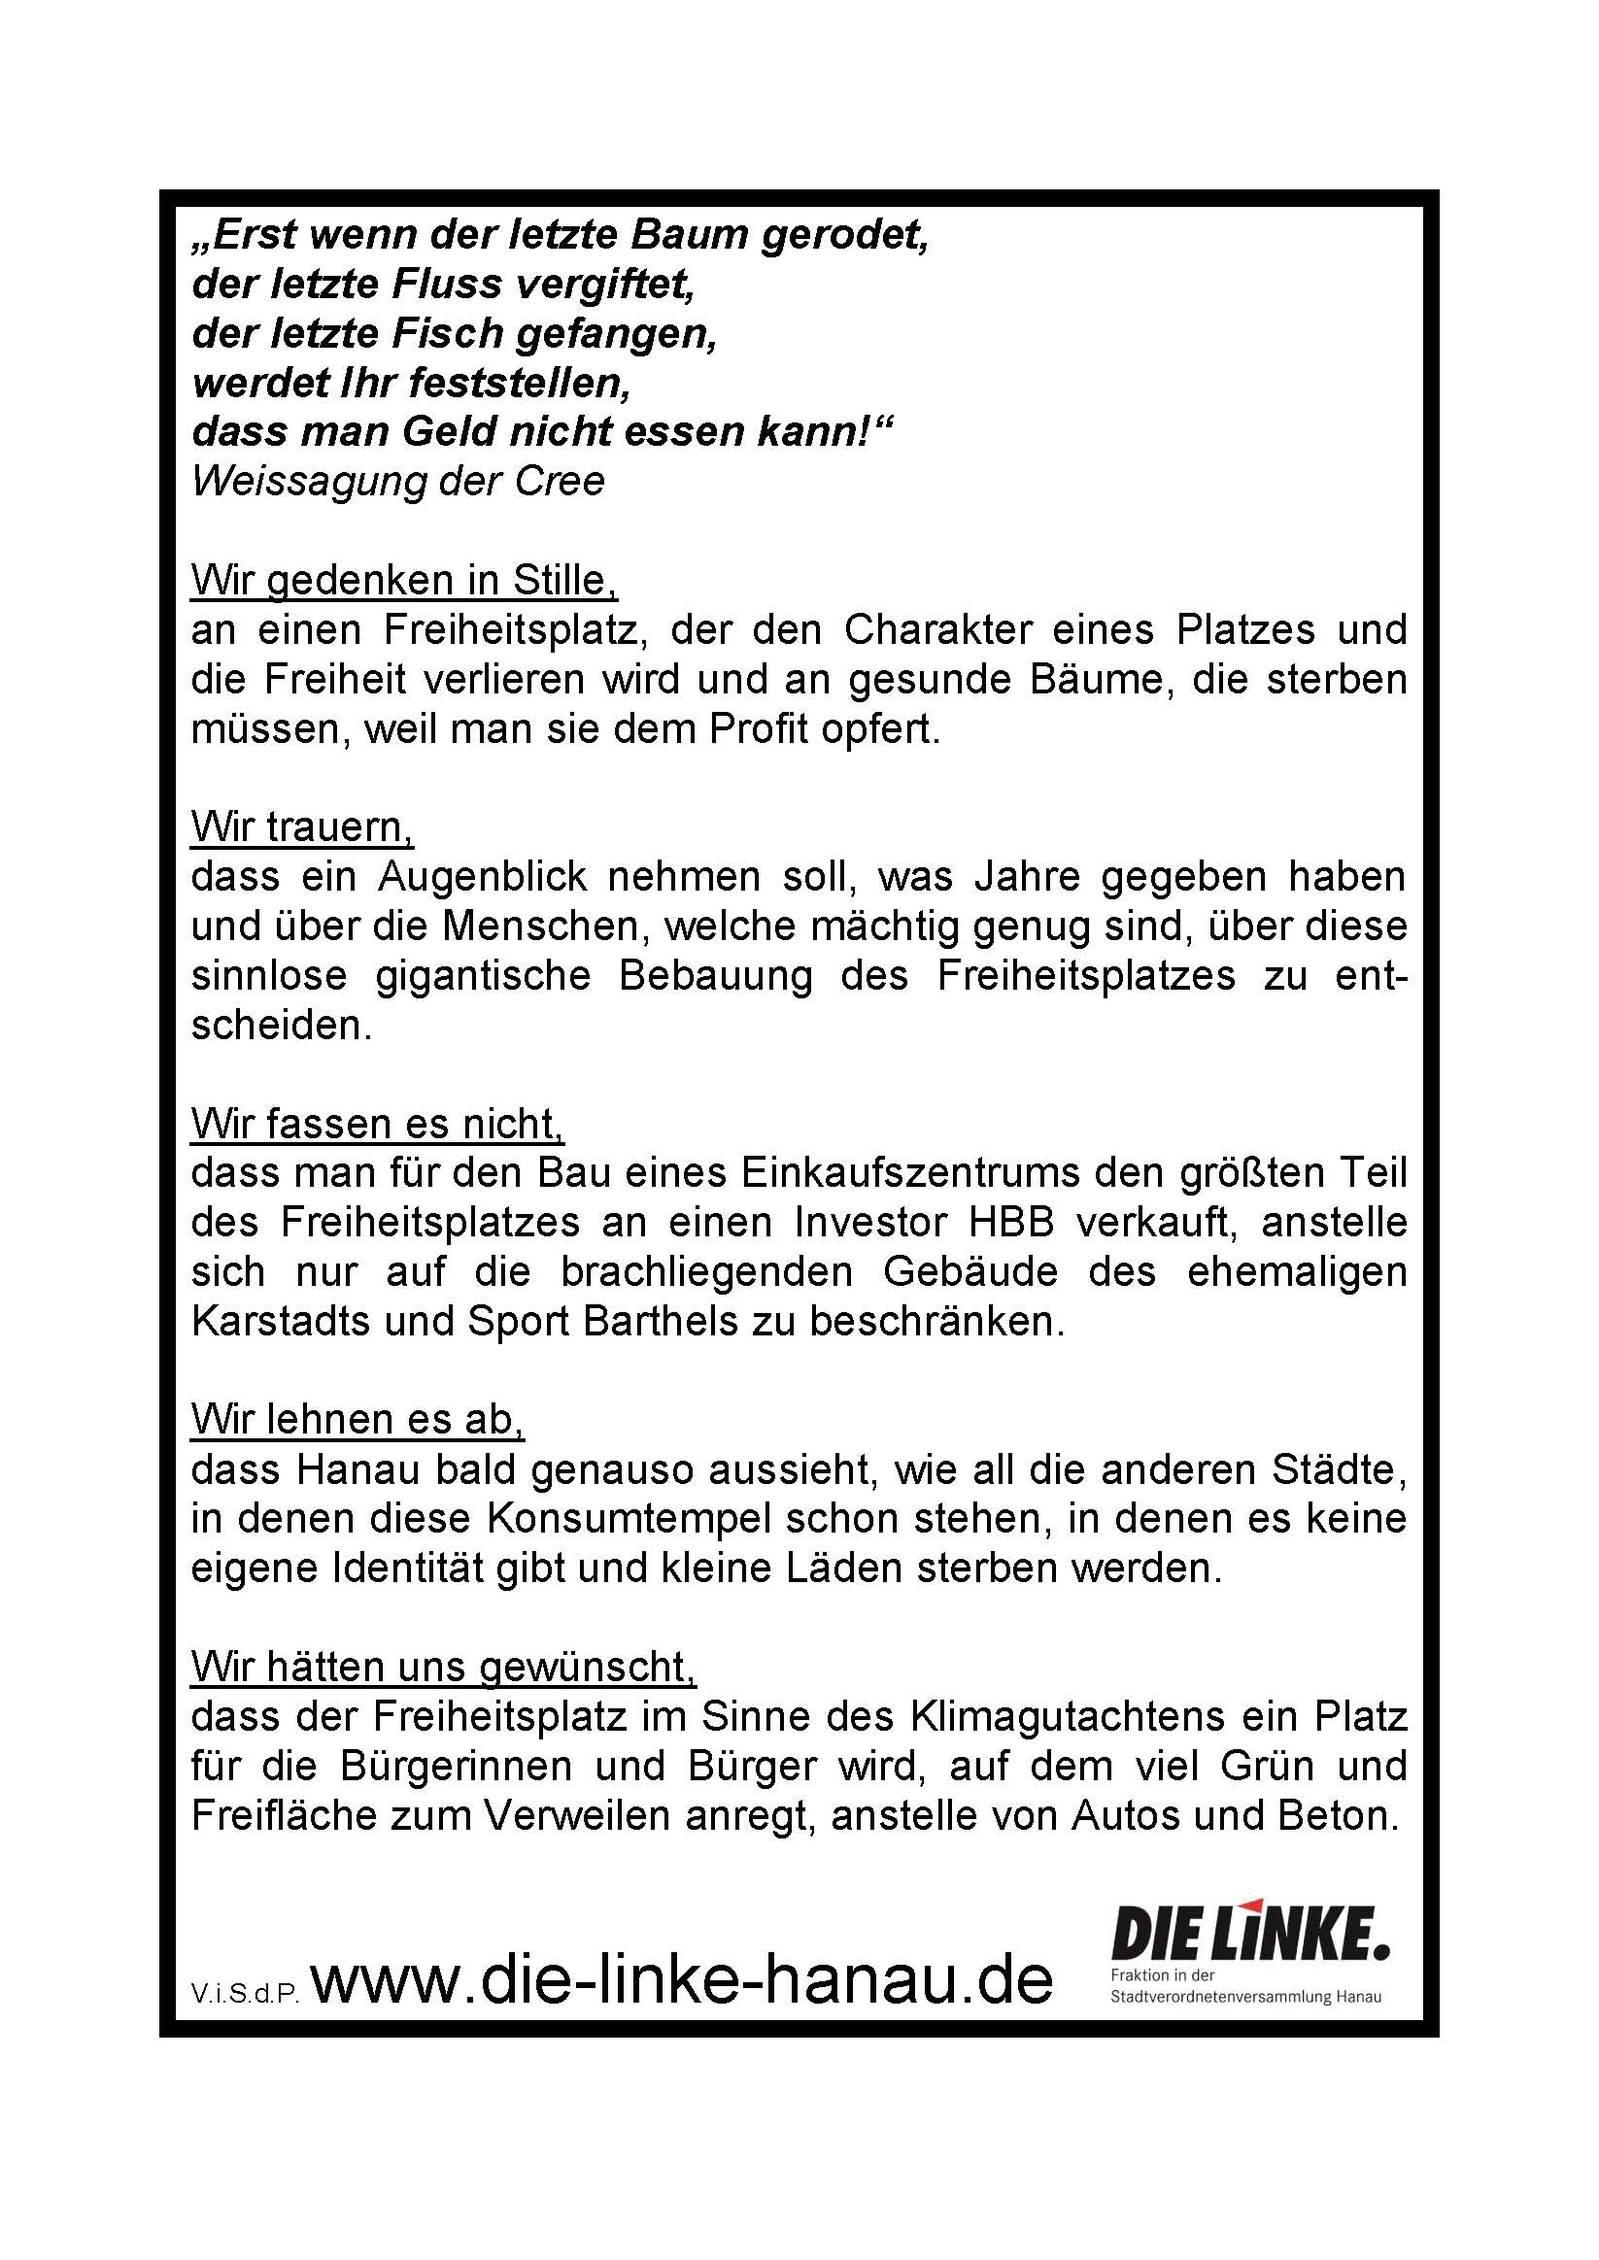 Innenstadtumbau / Wettbewerblicher Dialog: DIE LINKE. Ortsverband Hanau